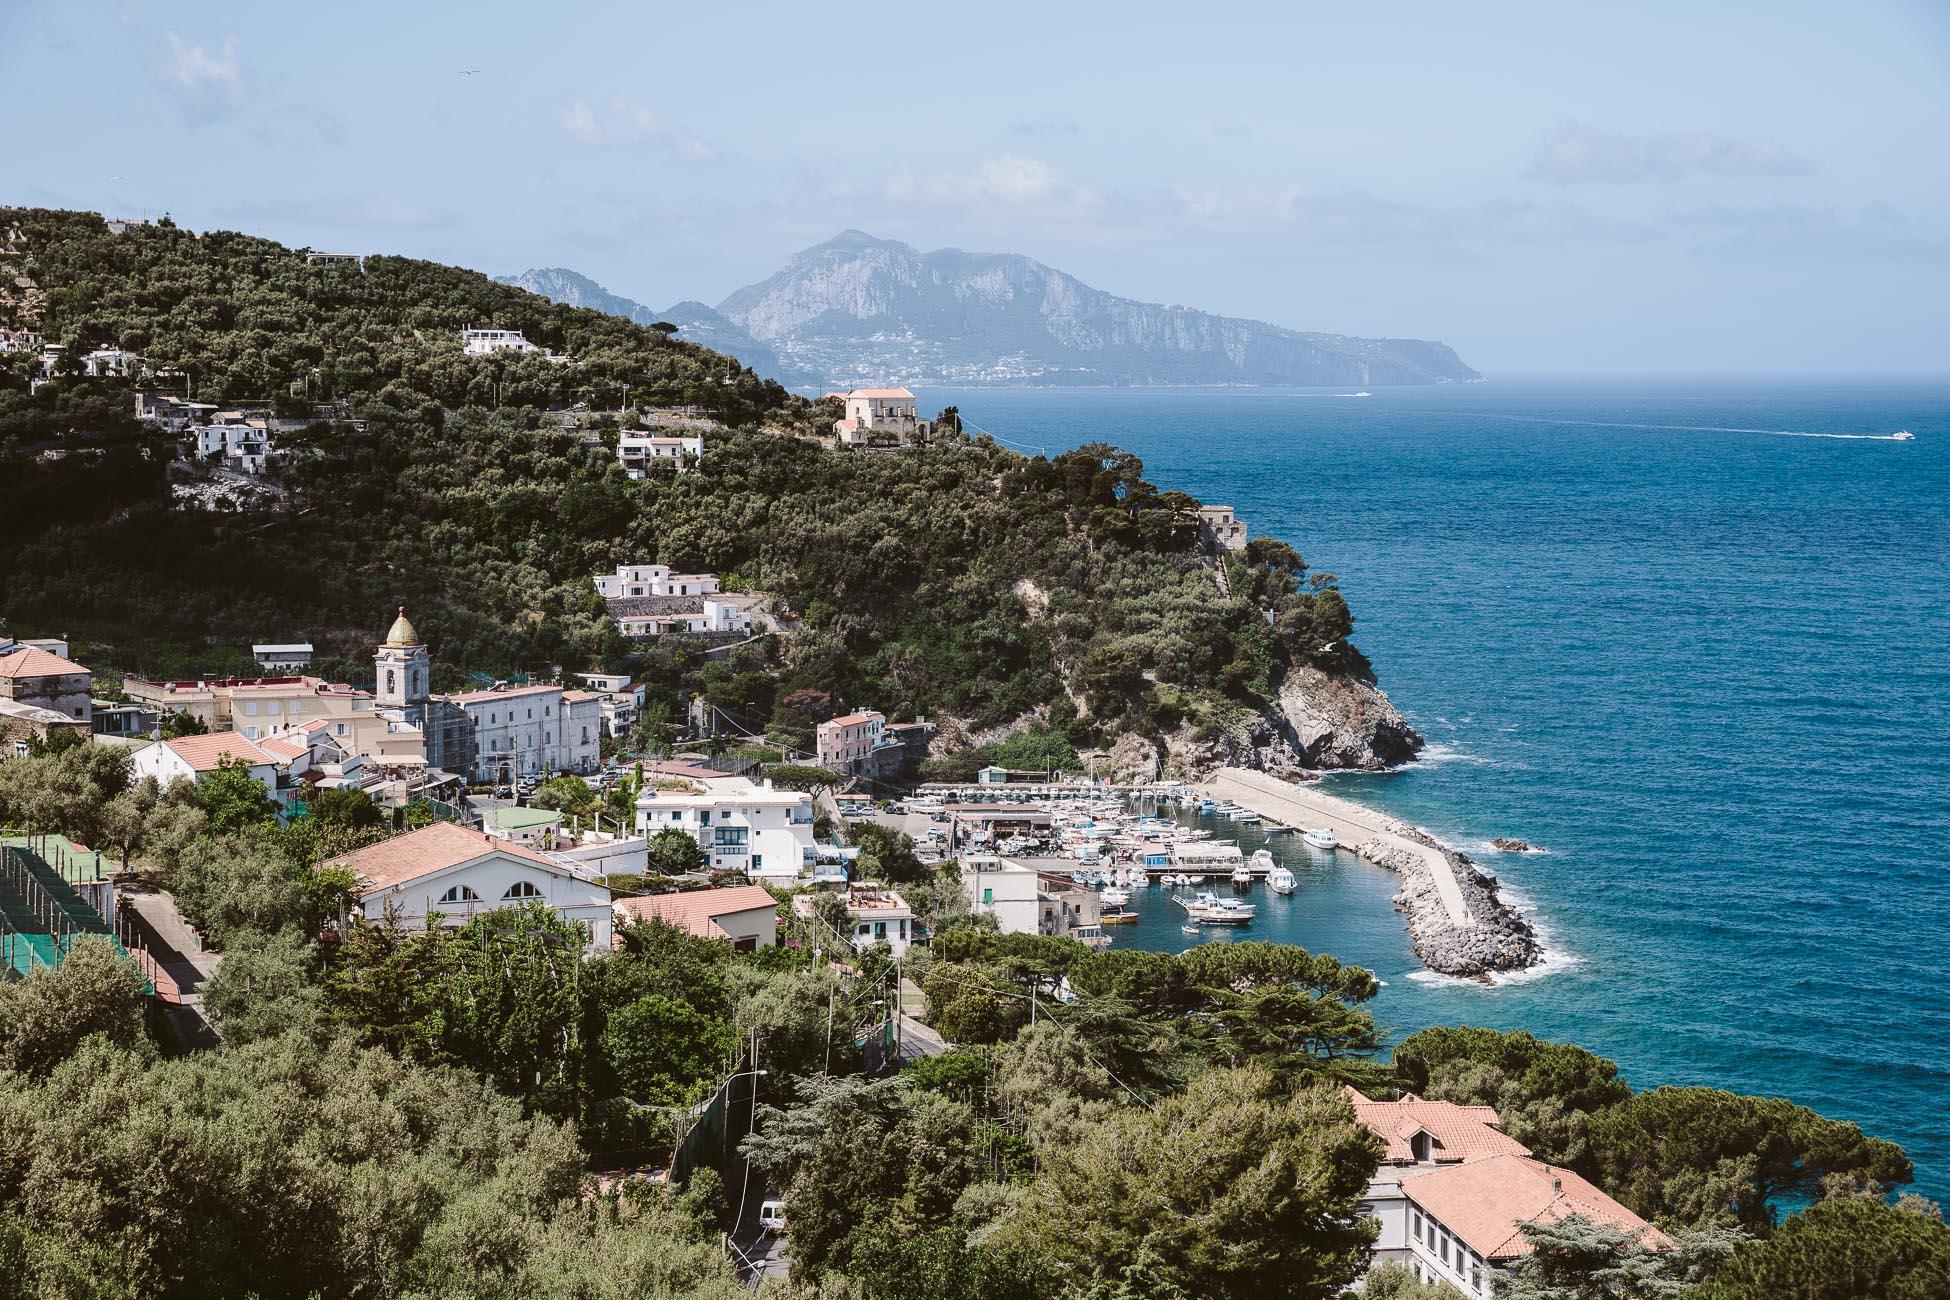 Views of Massa Lubrense Sorrento Coast